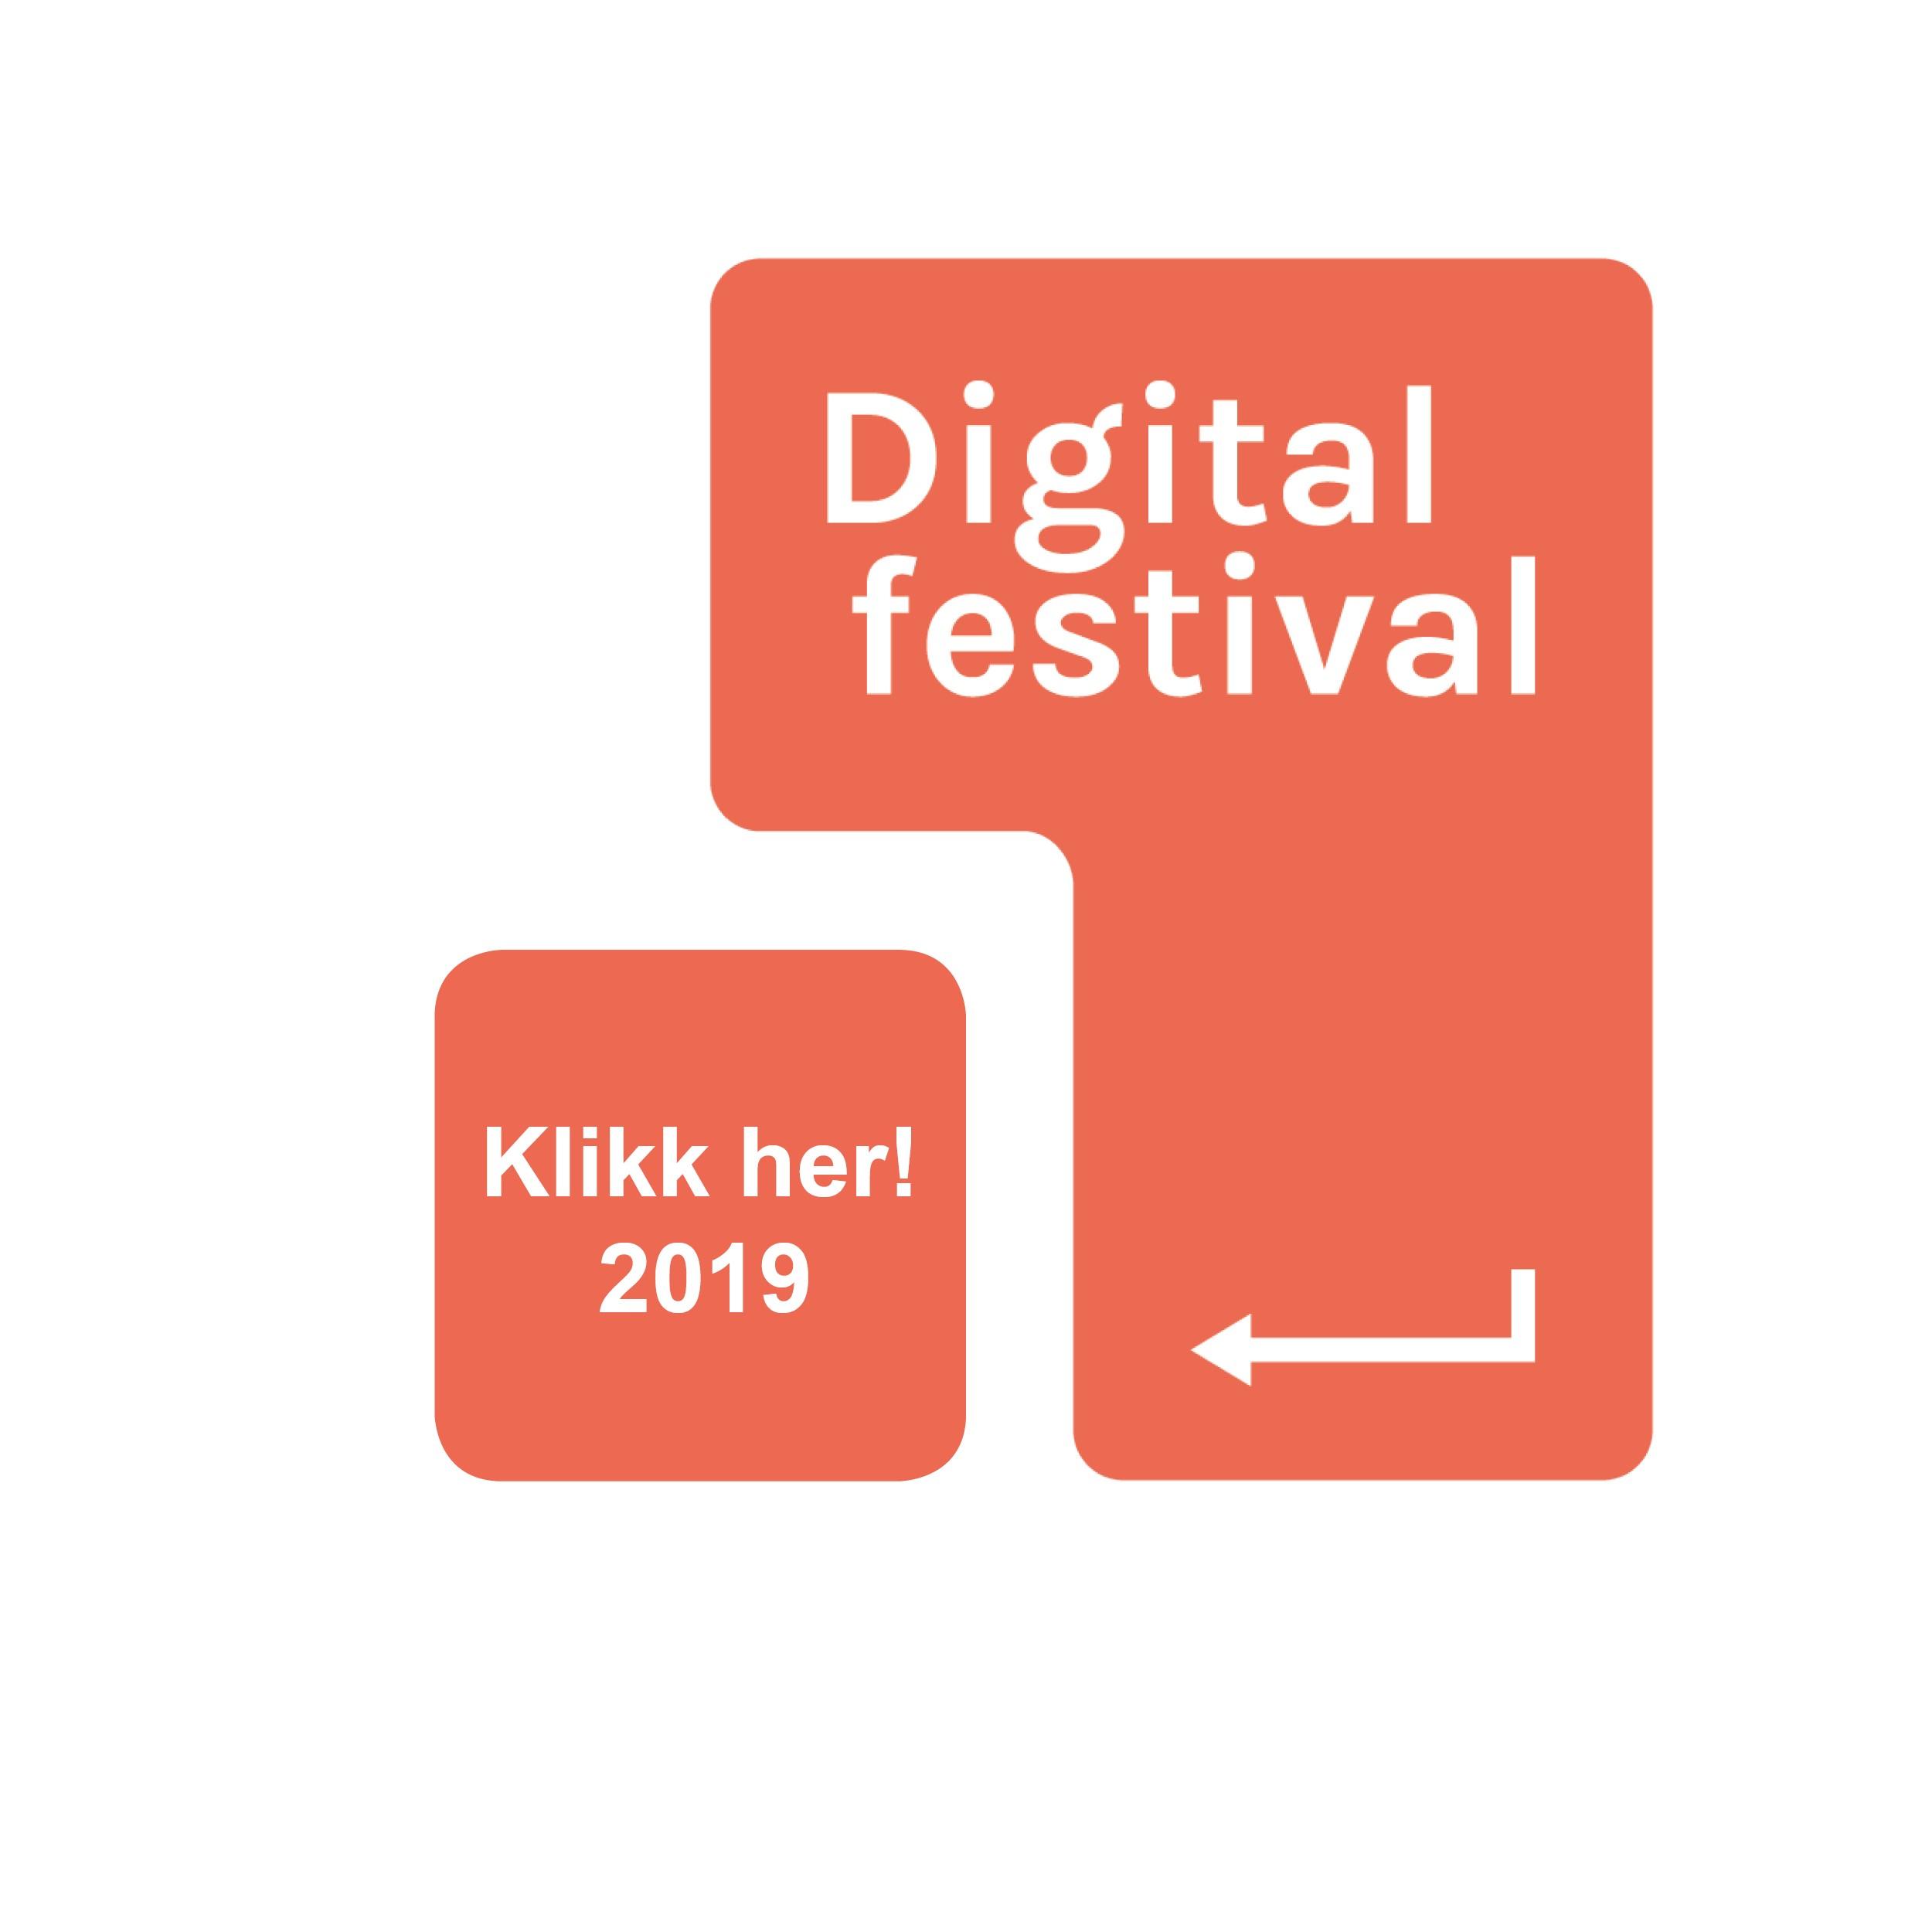 Digital festival 2019